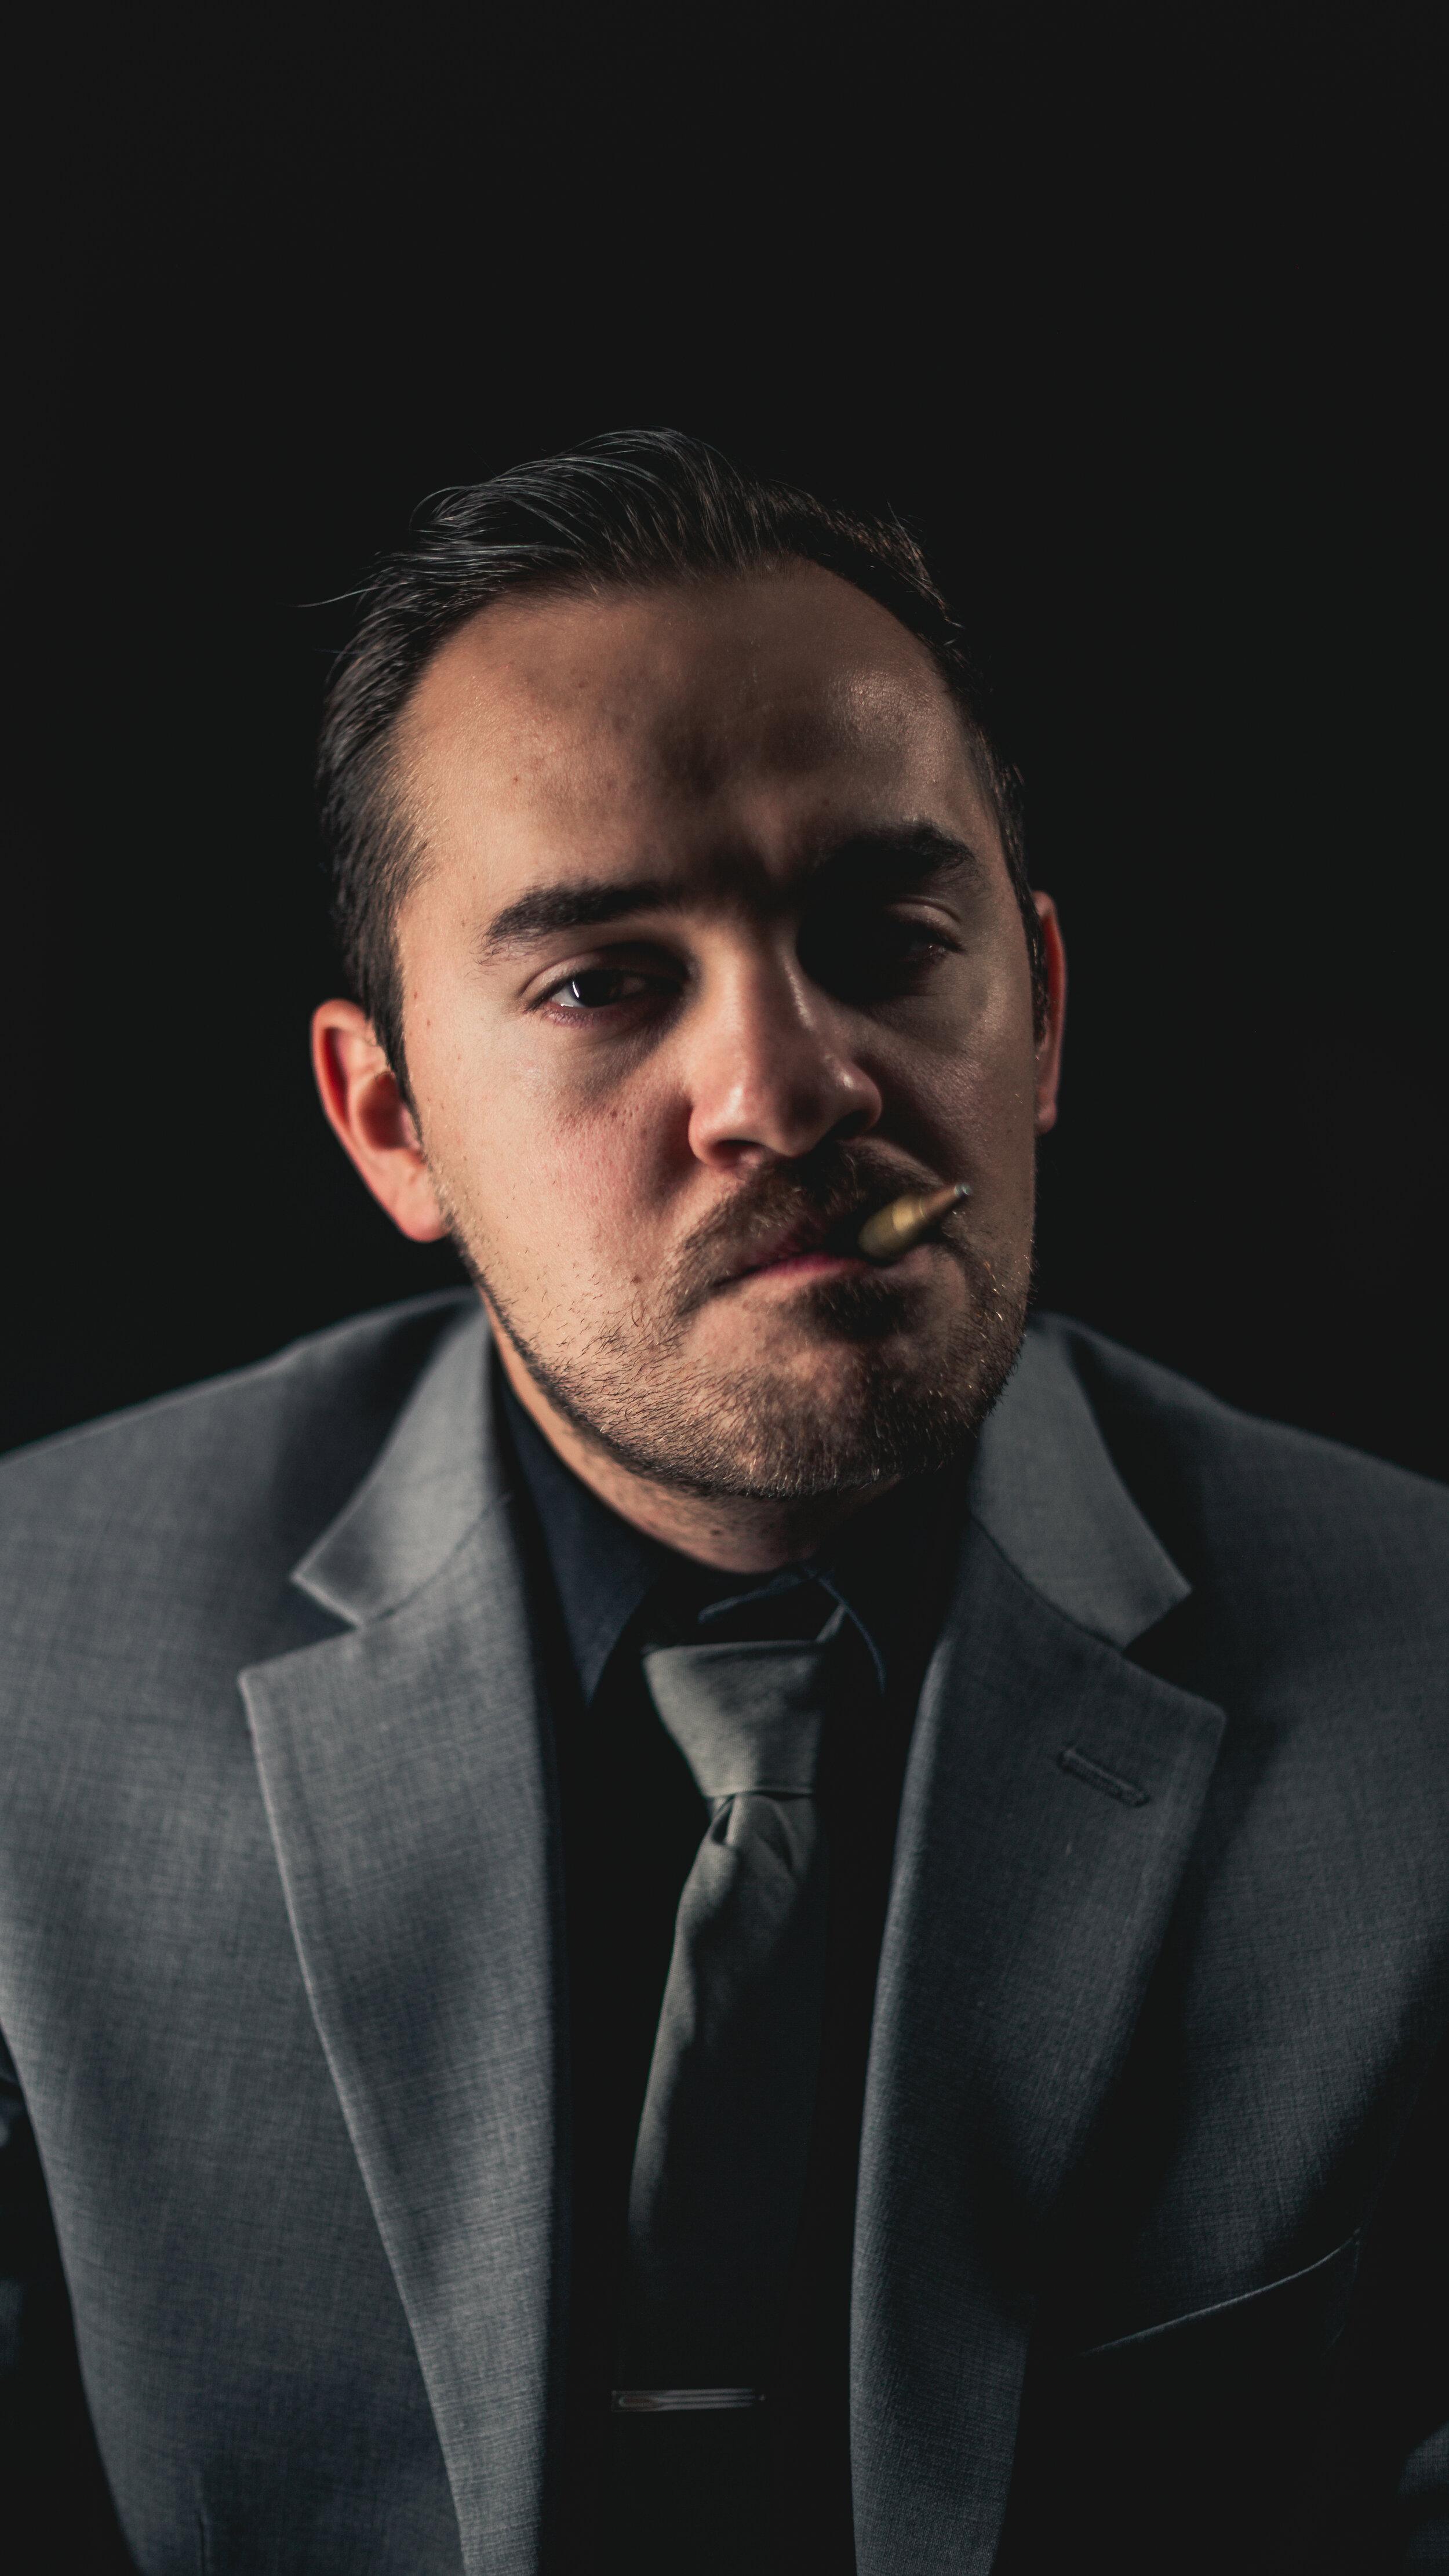 portrait-man-bullet-in-mouth-dressed-formal.jpg